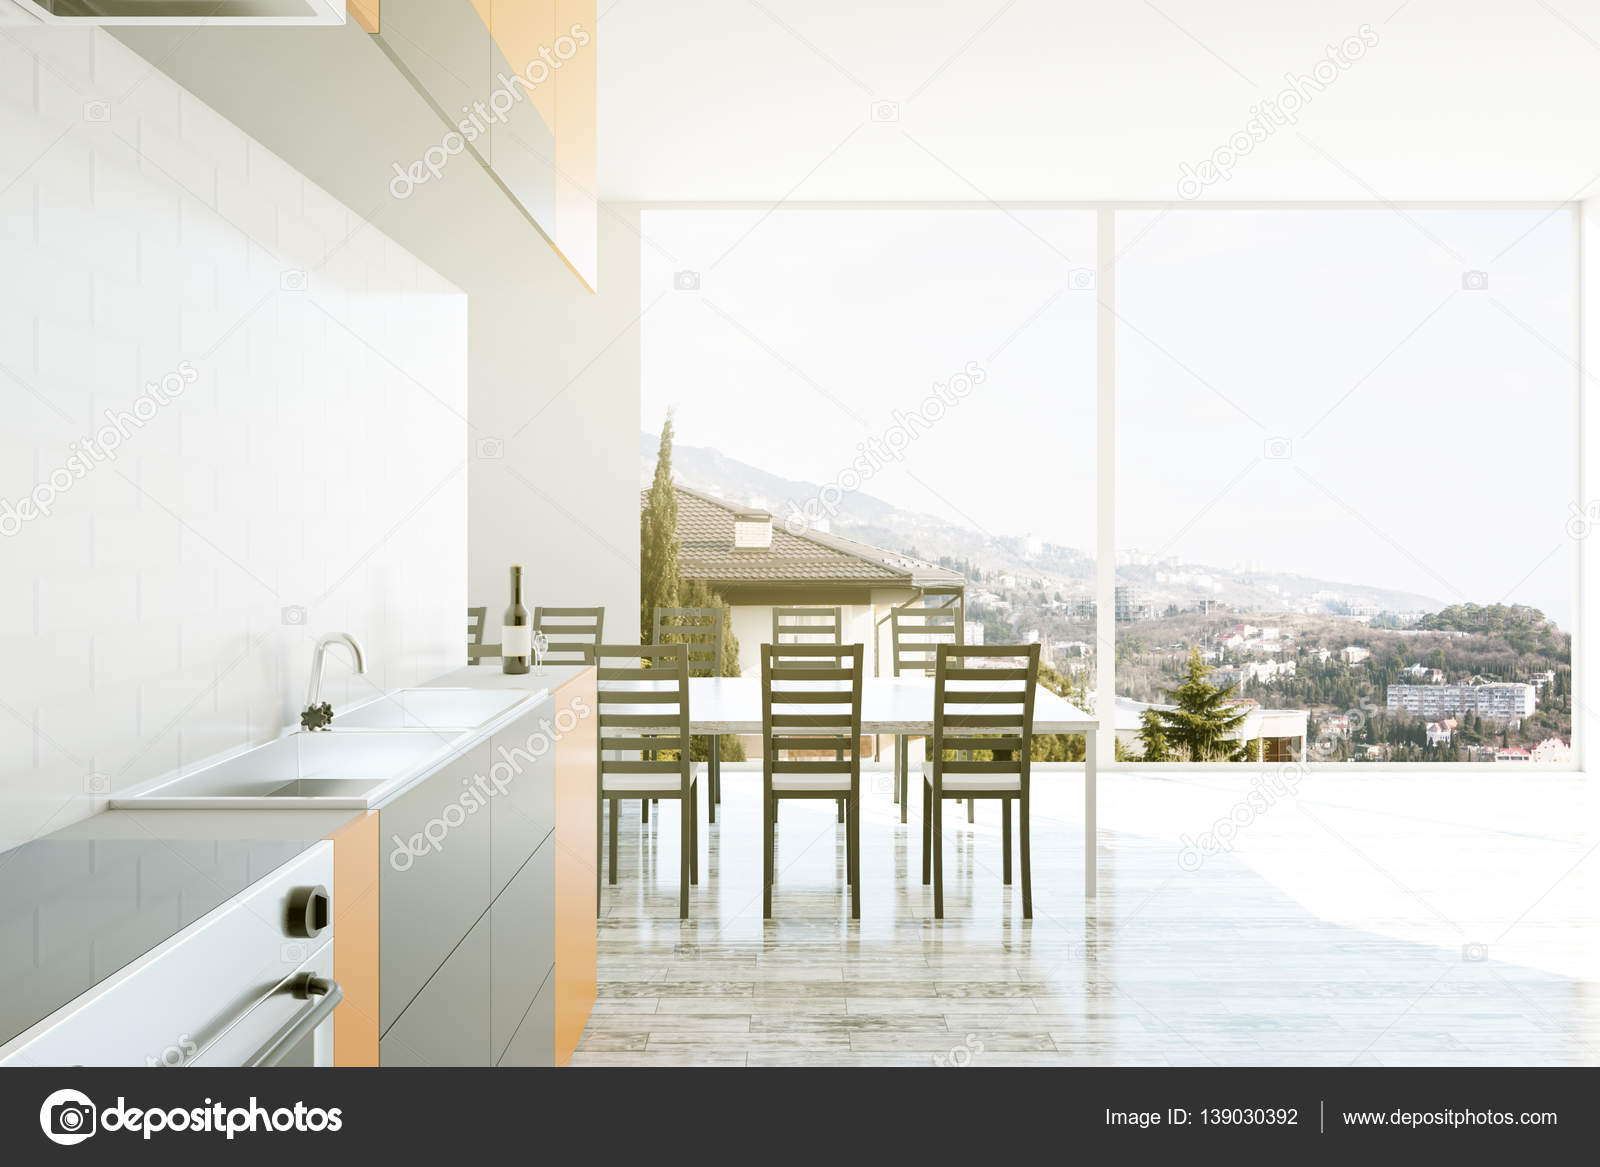 chairs for kitchen table prefab outdoor kits 室内装饰厨房 桌子和椅子 3d 渲染 图库照片 c peshkova 139030392 照片作者peshkova